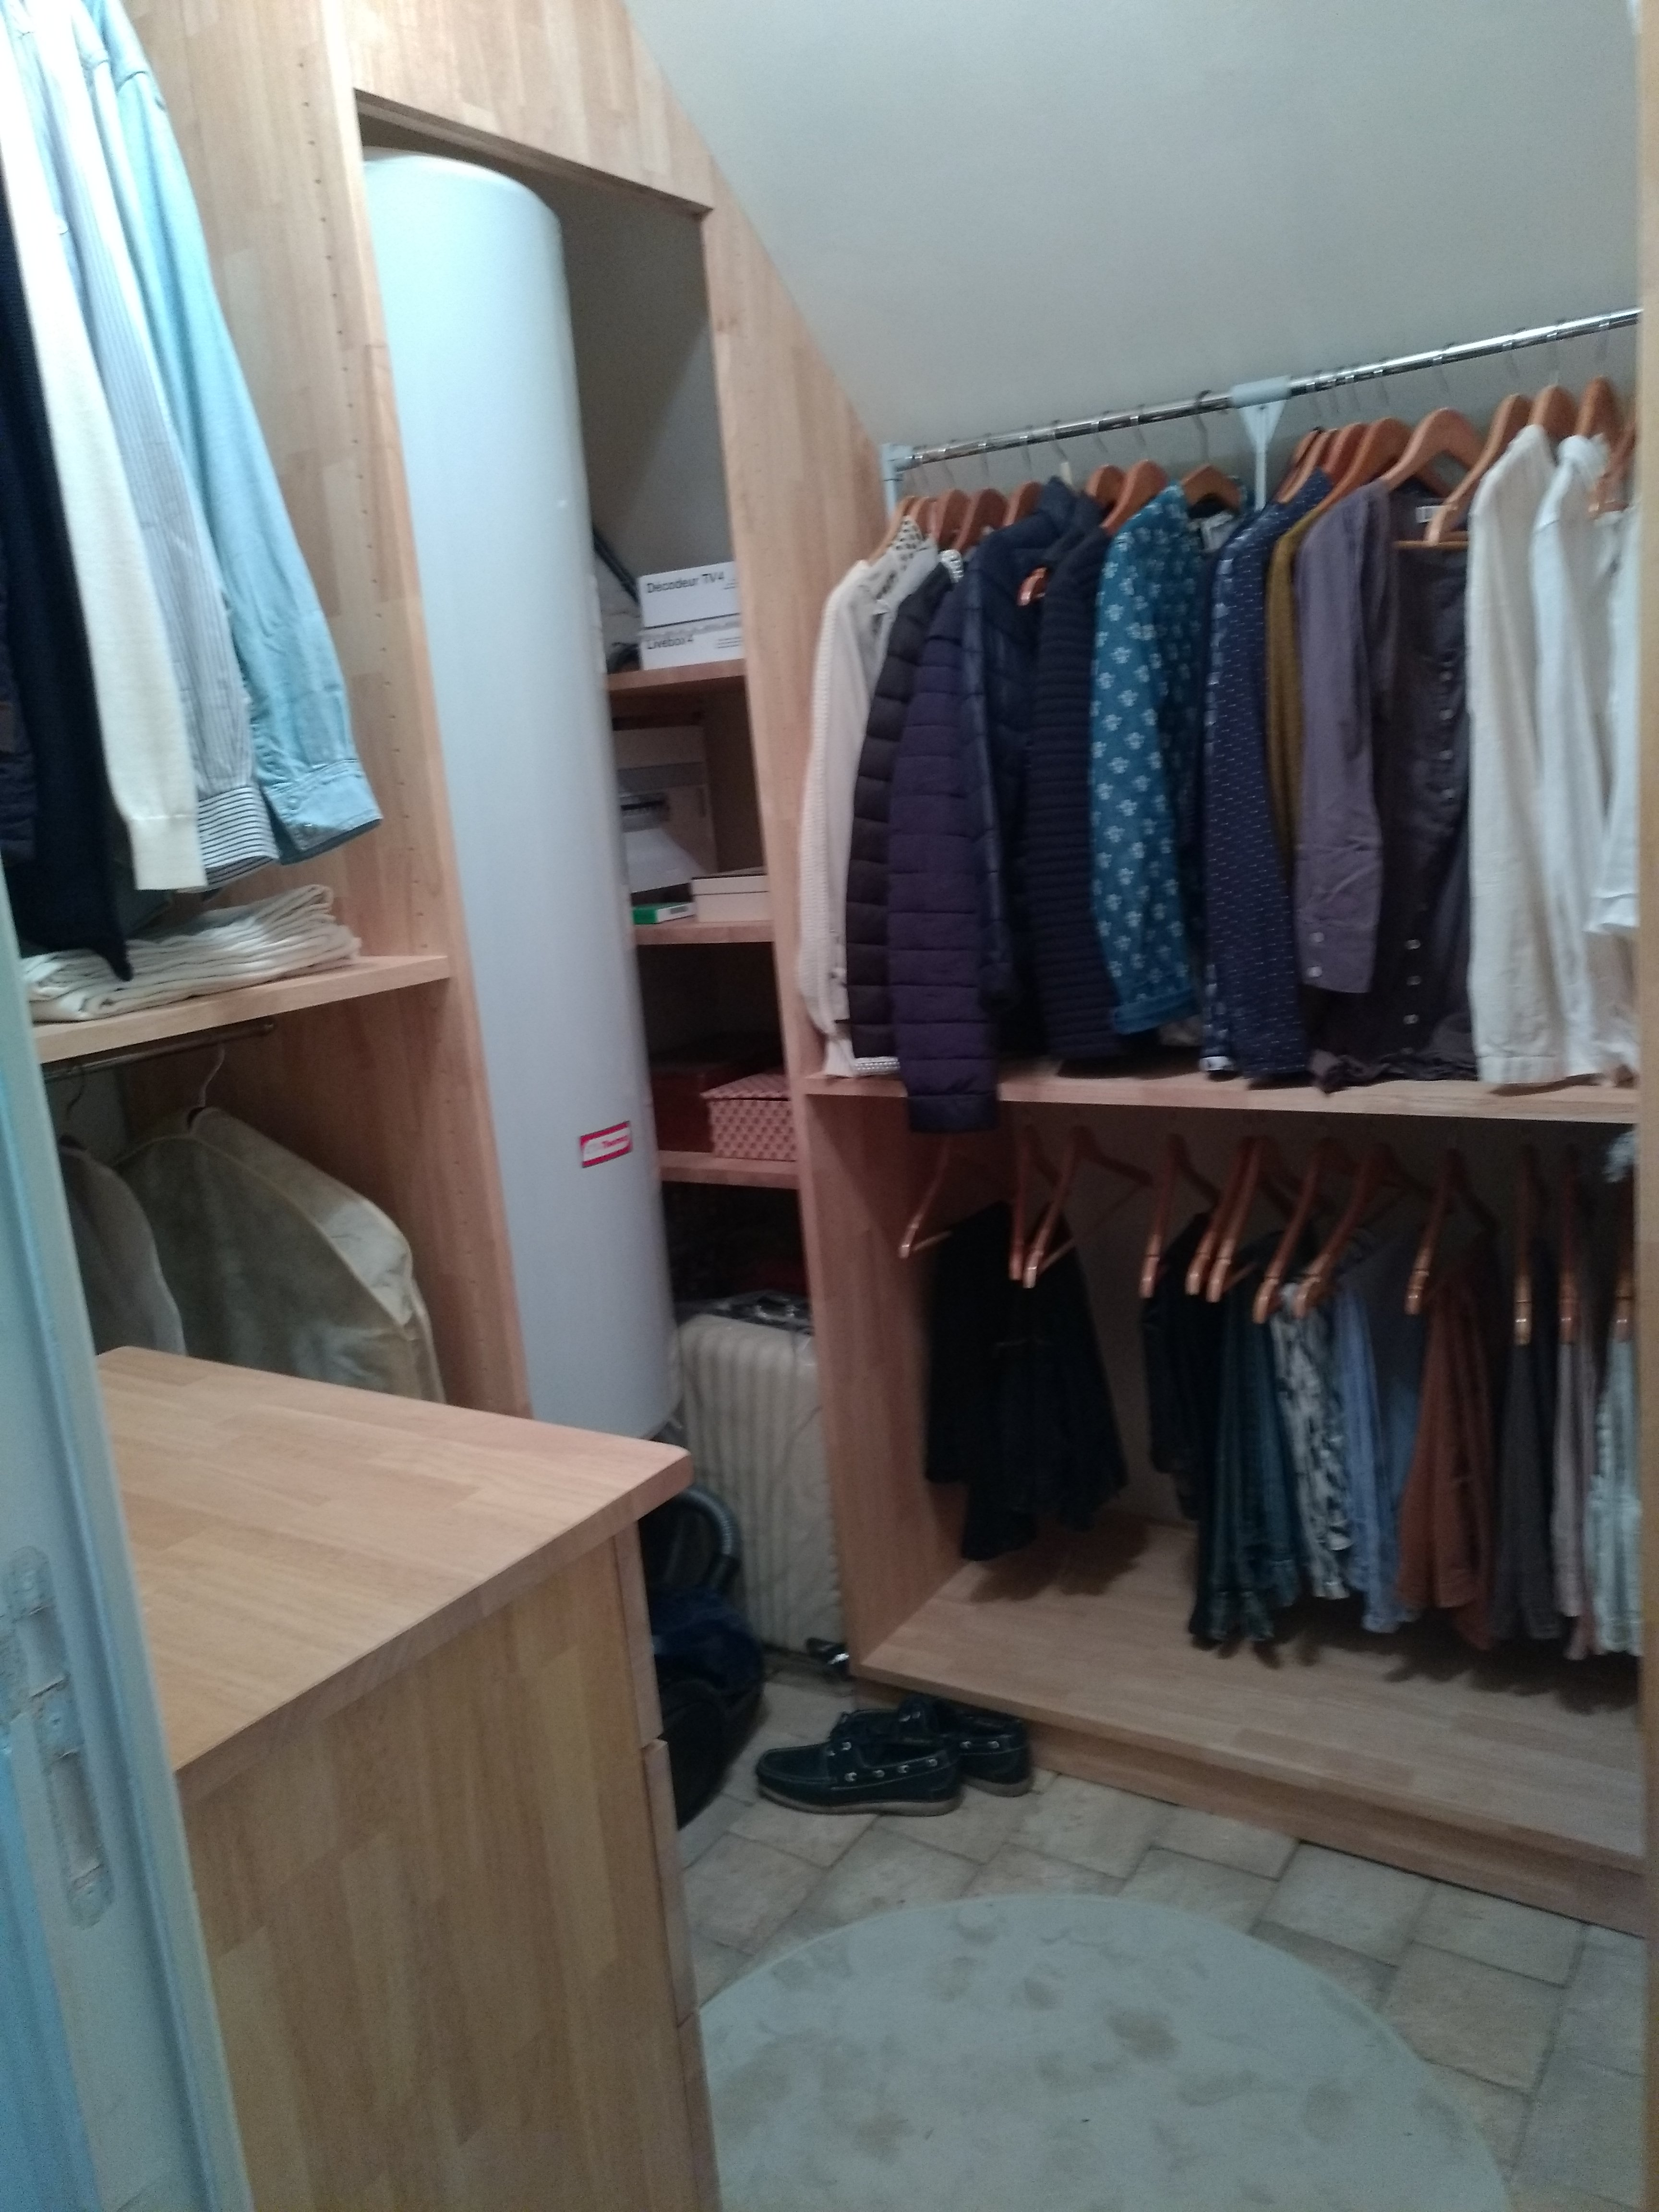 Agencement d'un dressing